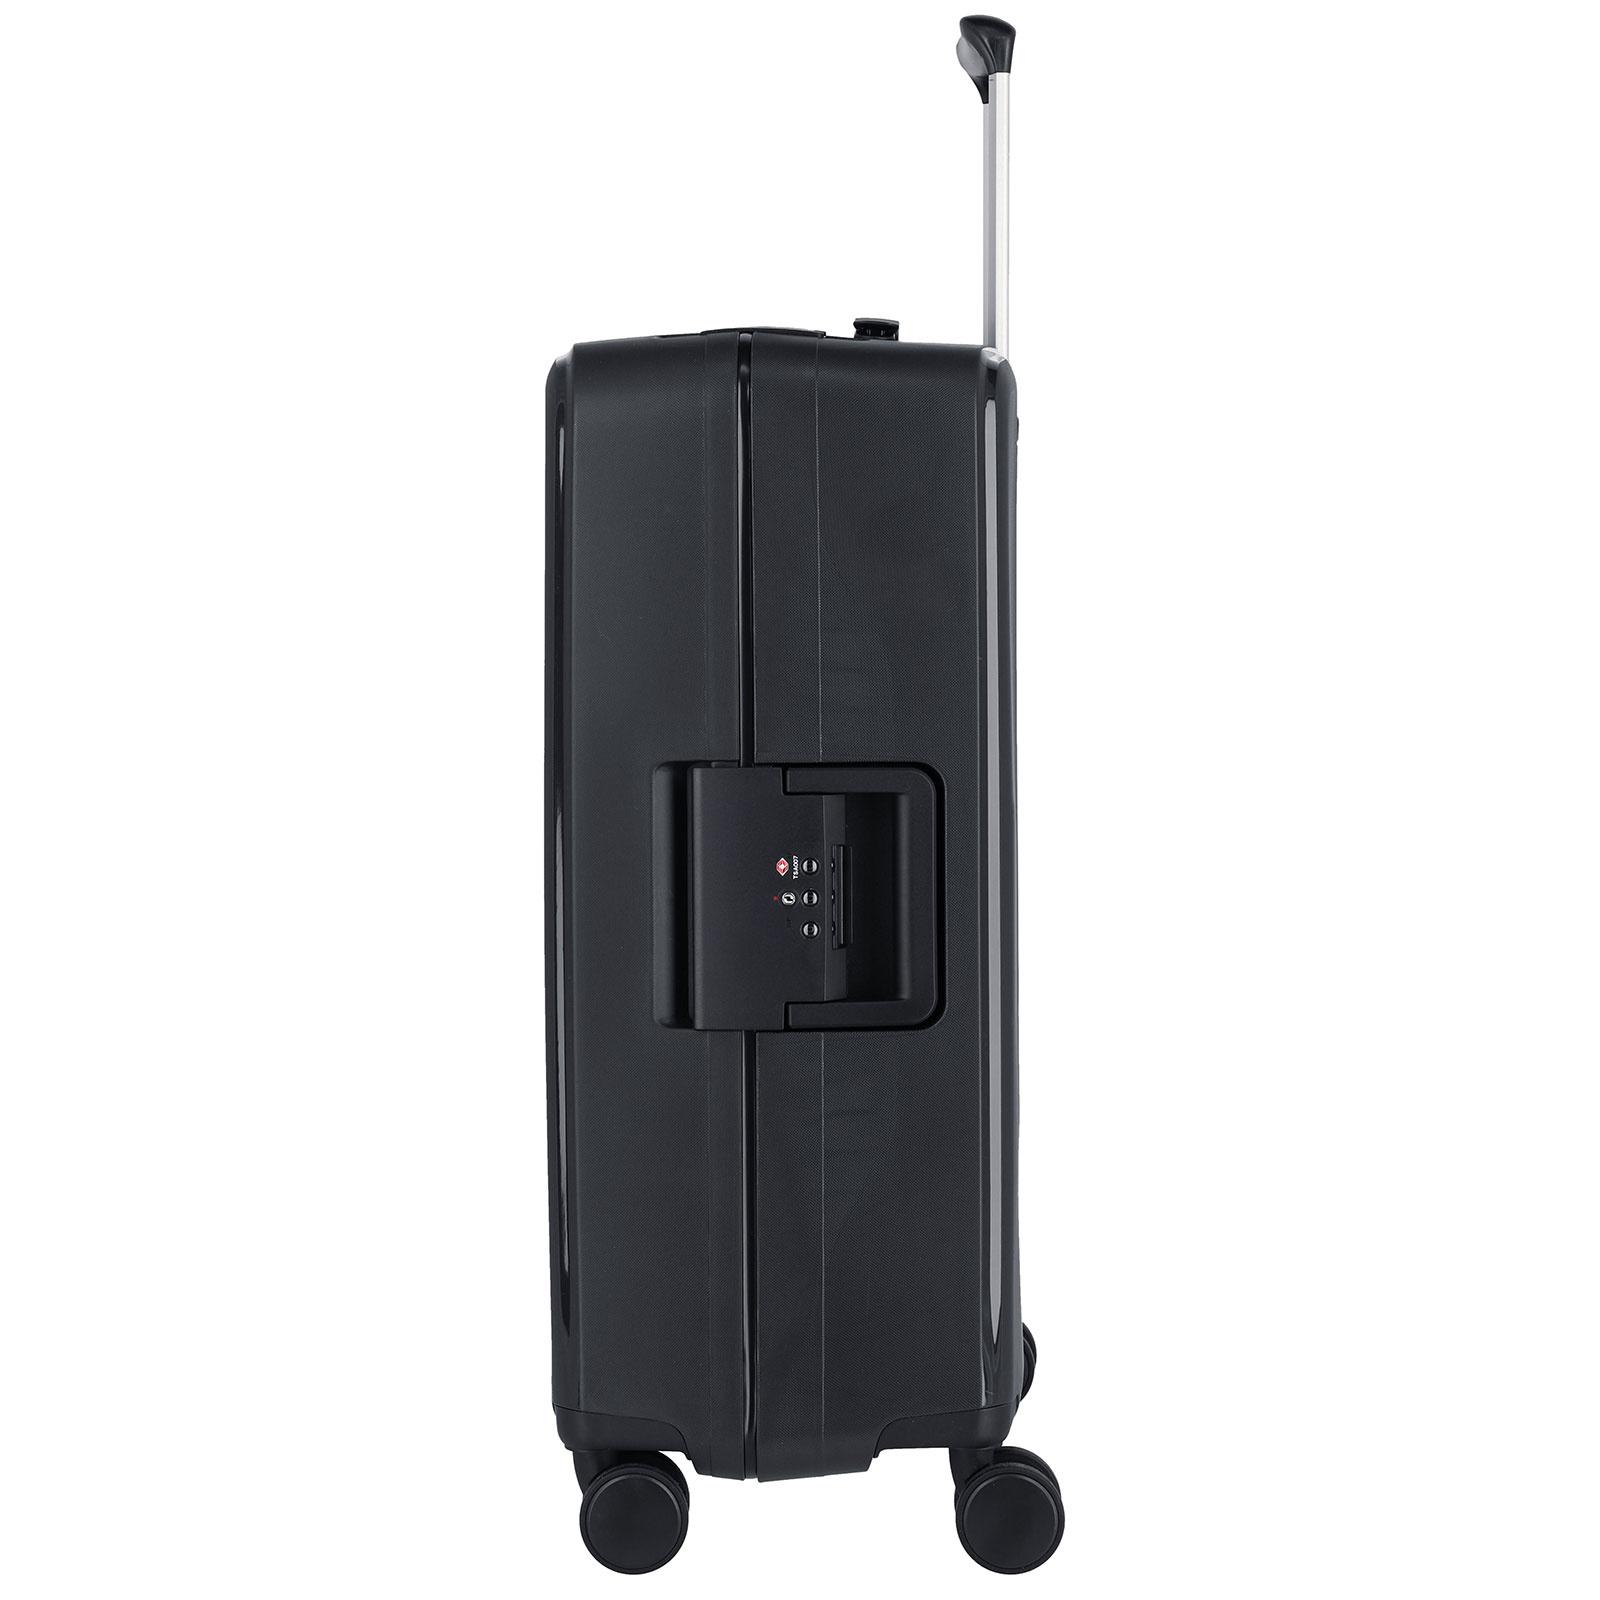 Travelite Terminal Spinner 67 cm middenmaat koffer - Black - harde koffer zonder rits